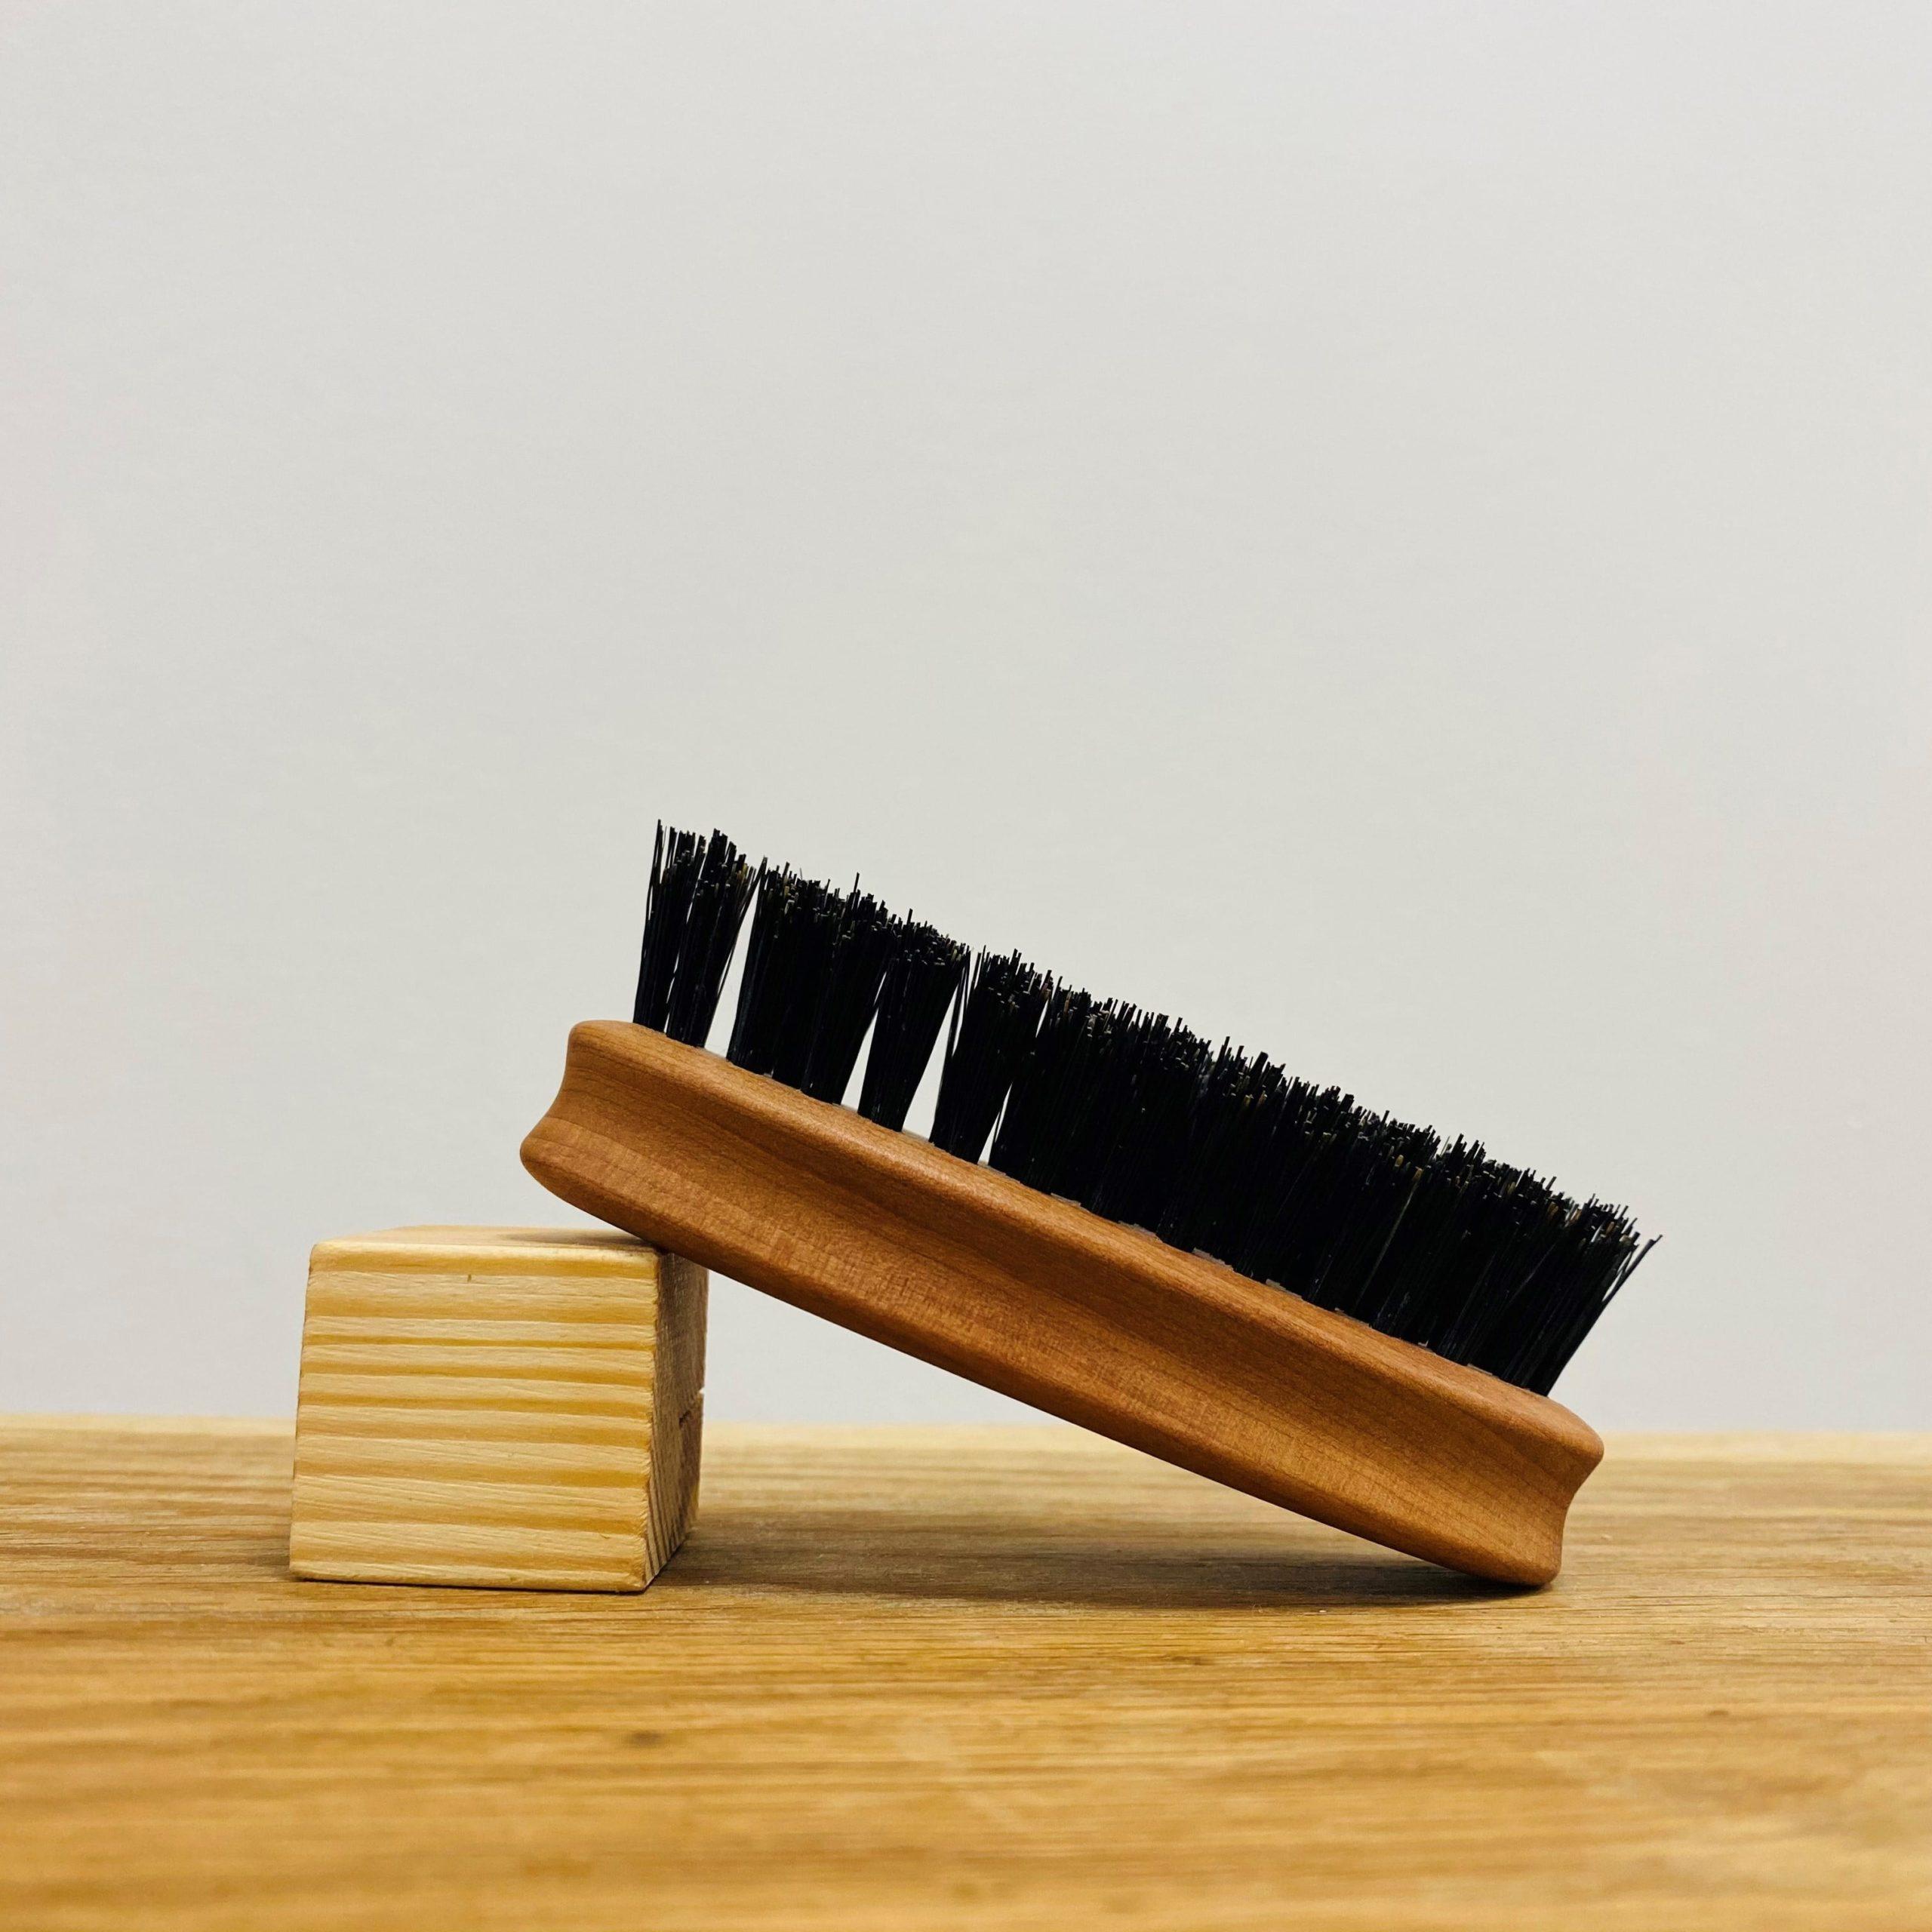 Gentlemanbarbier brosse à barbe Poirier & Sanglier